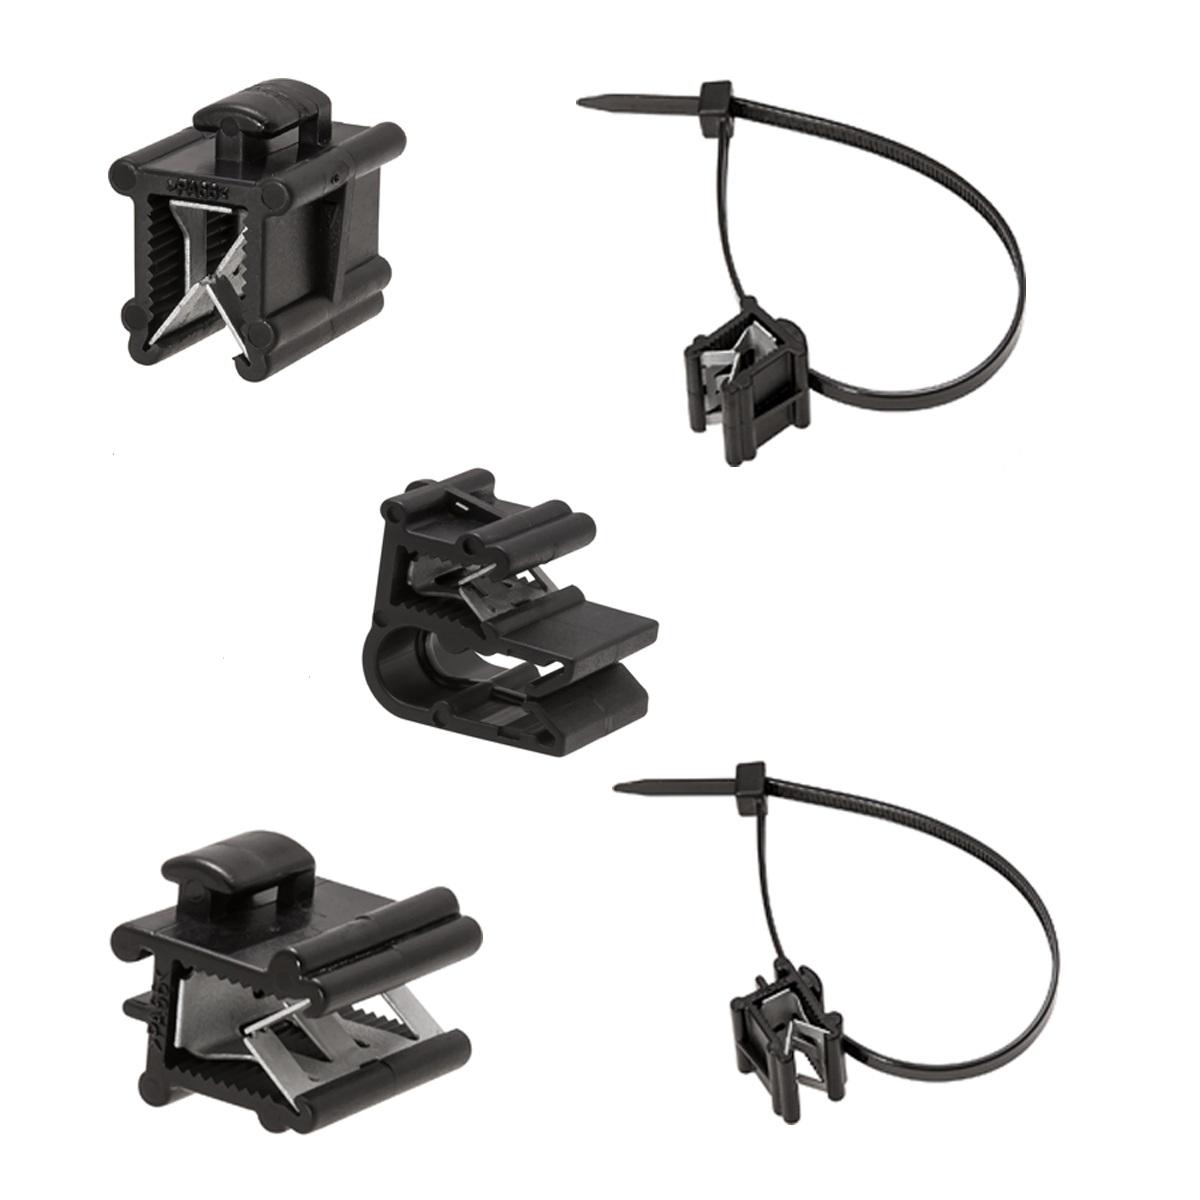 Inetparts Com Ilsco Connectors Mechanical Insulated